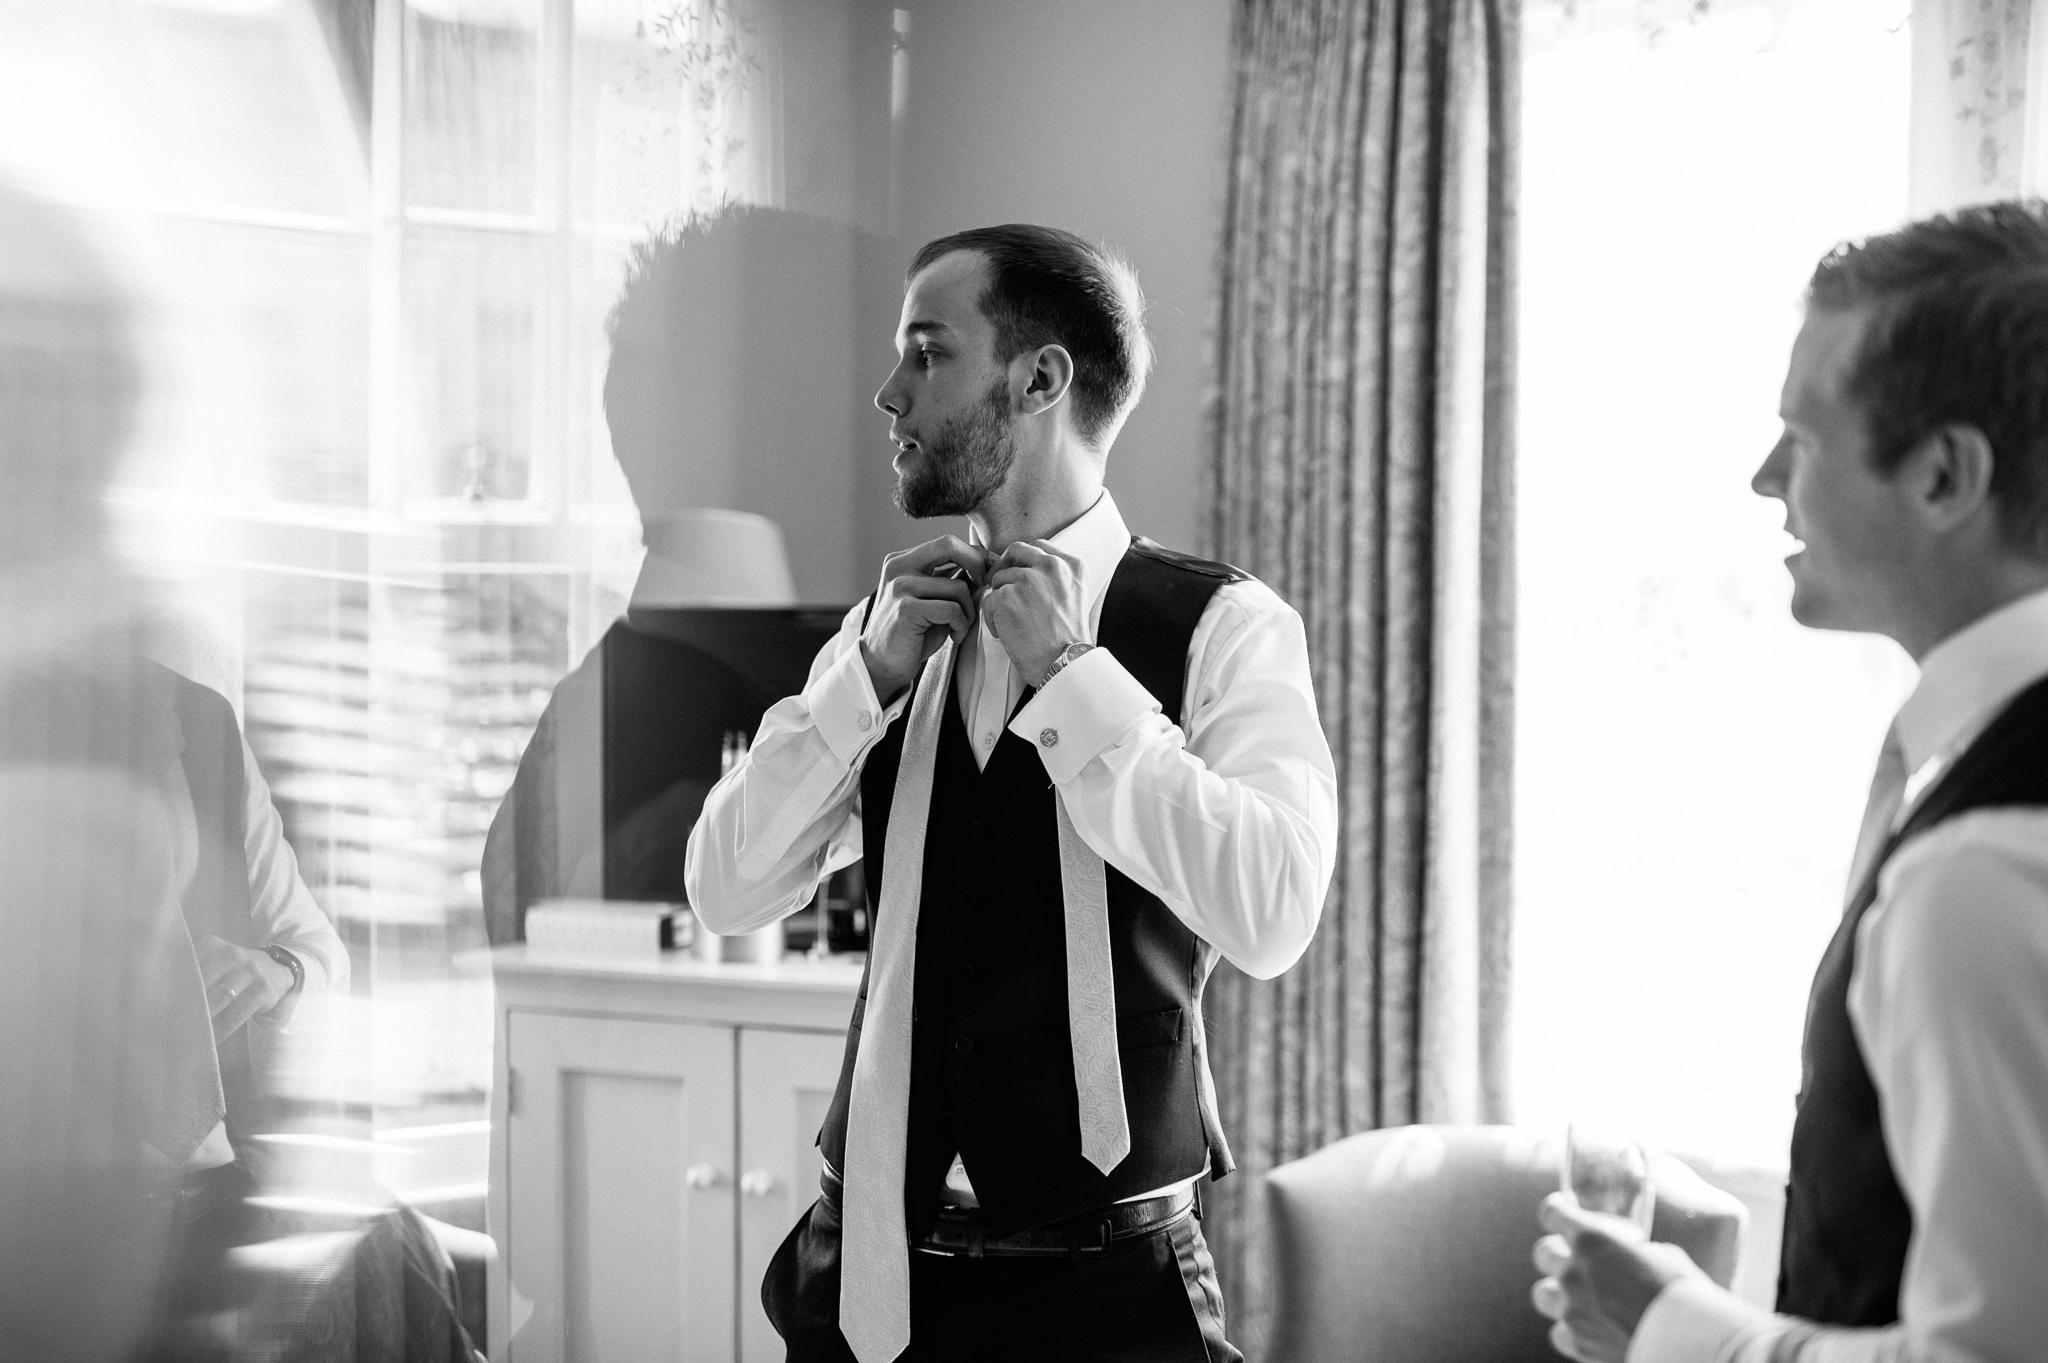 usher puts tie on